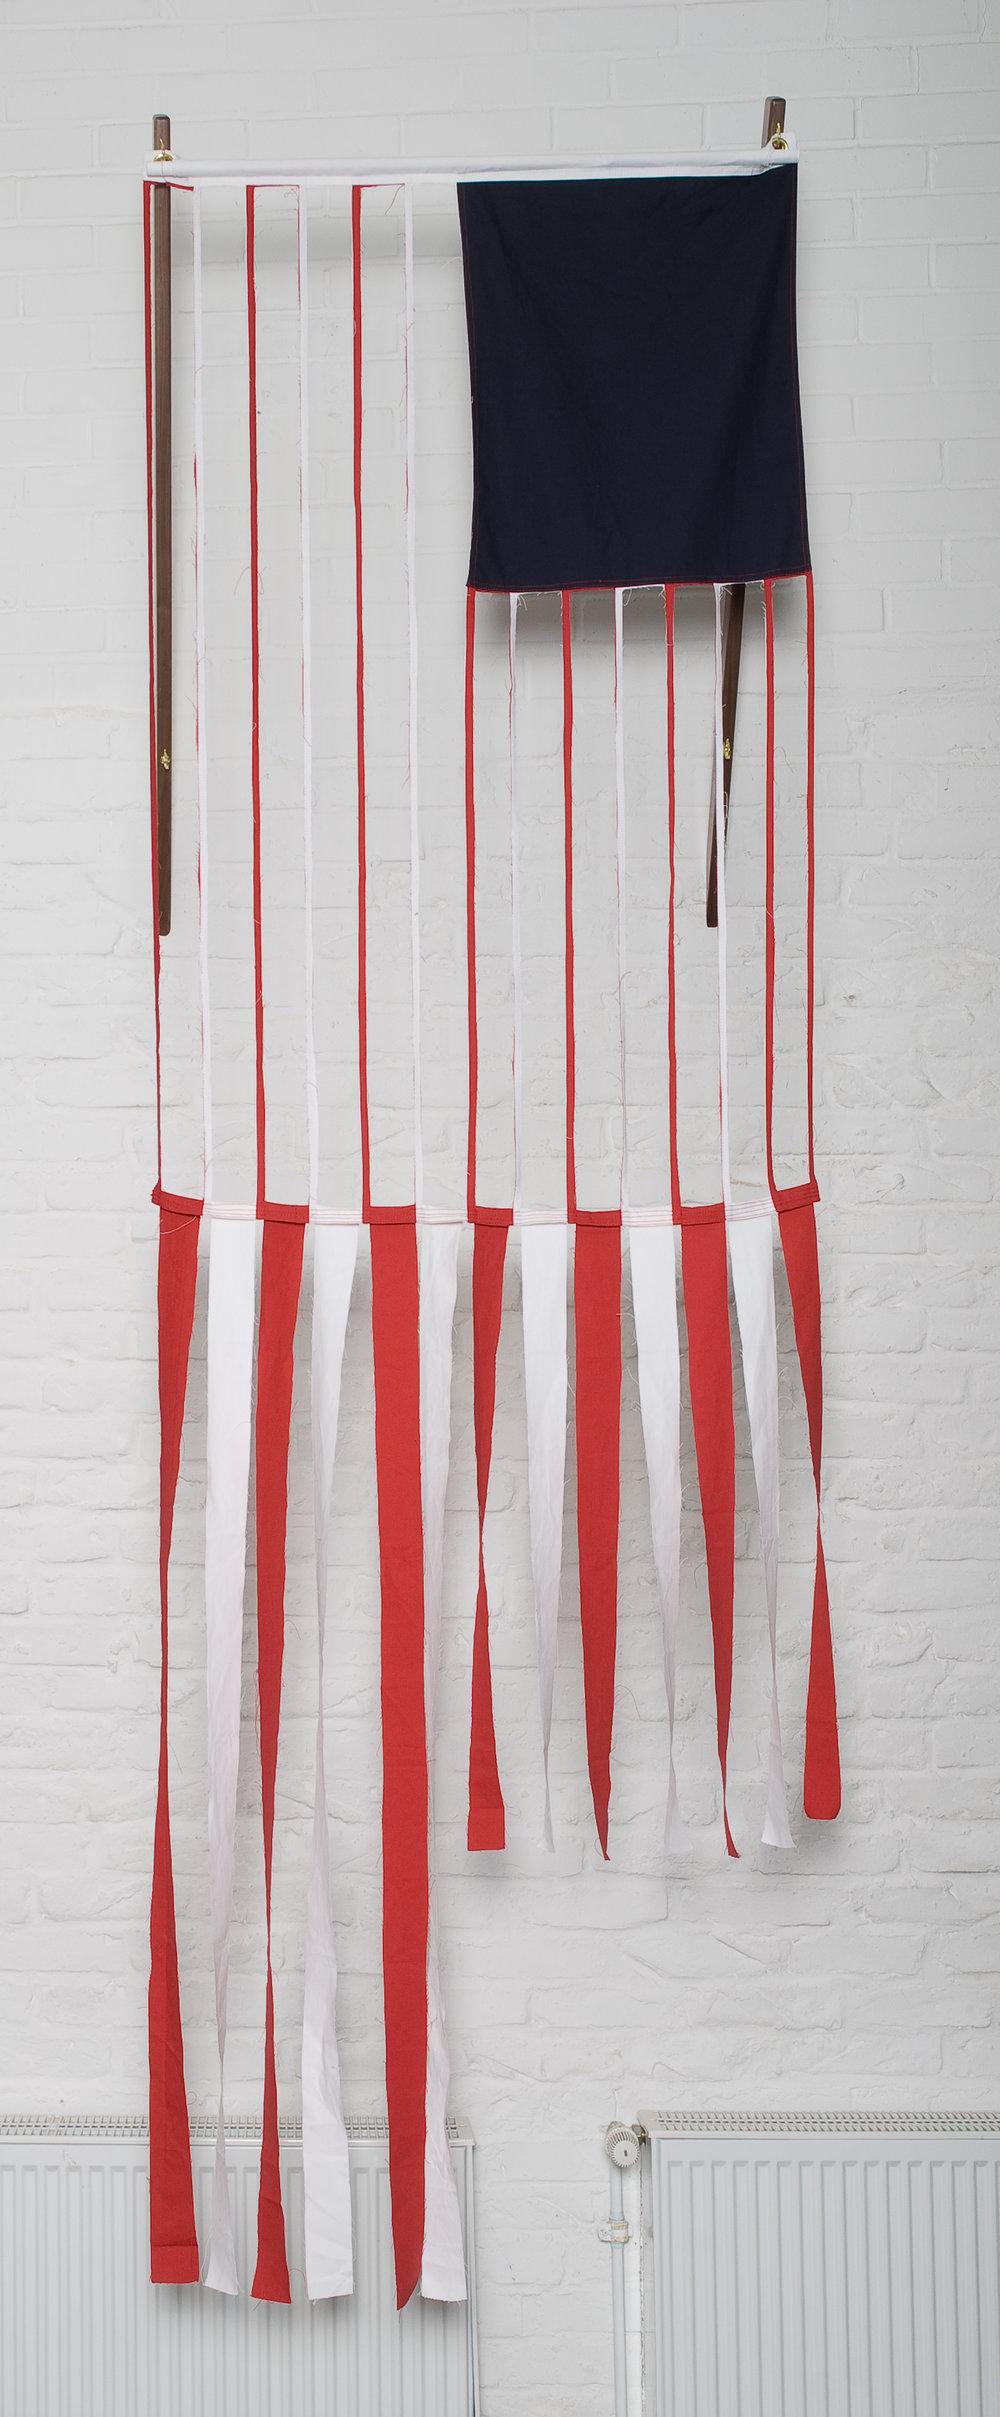 Red/White Stripes, 2008 cotton canvas 152 x 91 cm - 59 7/8 x 35 7/8 inches